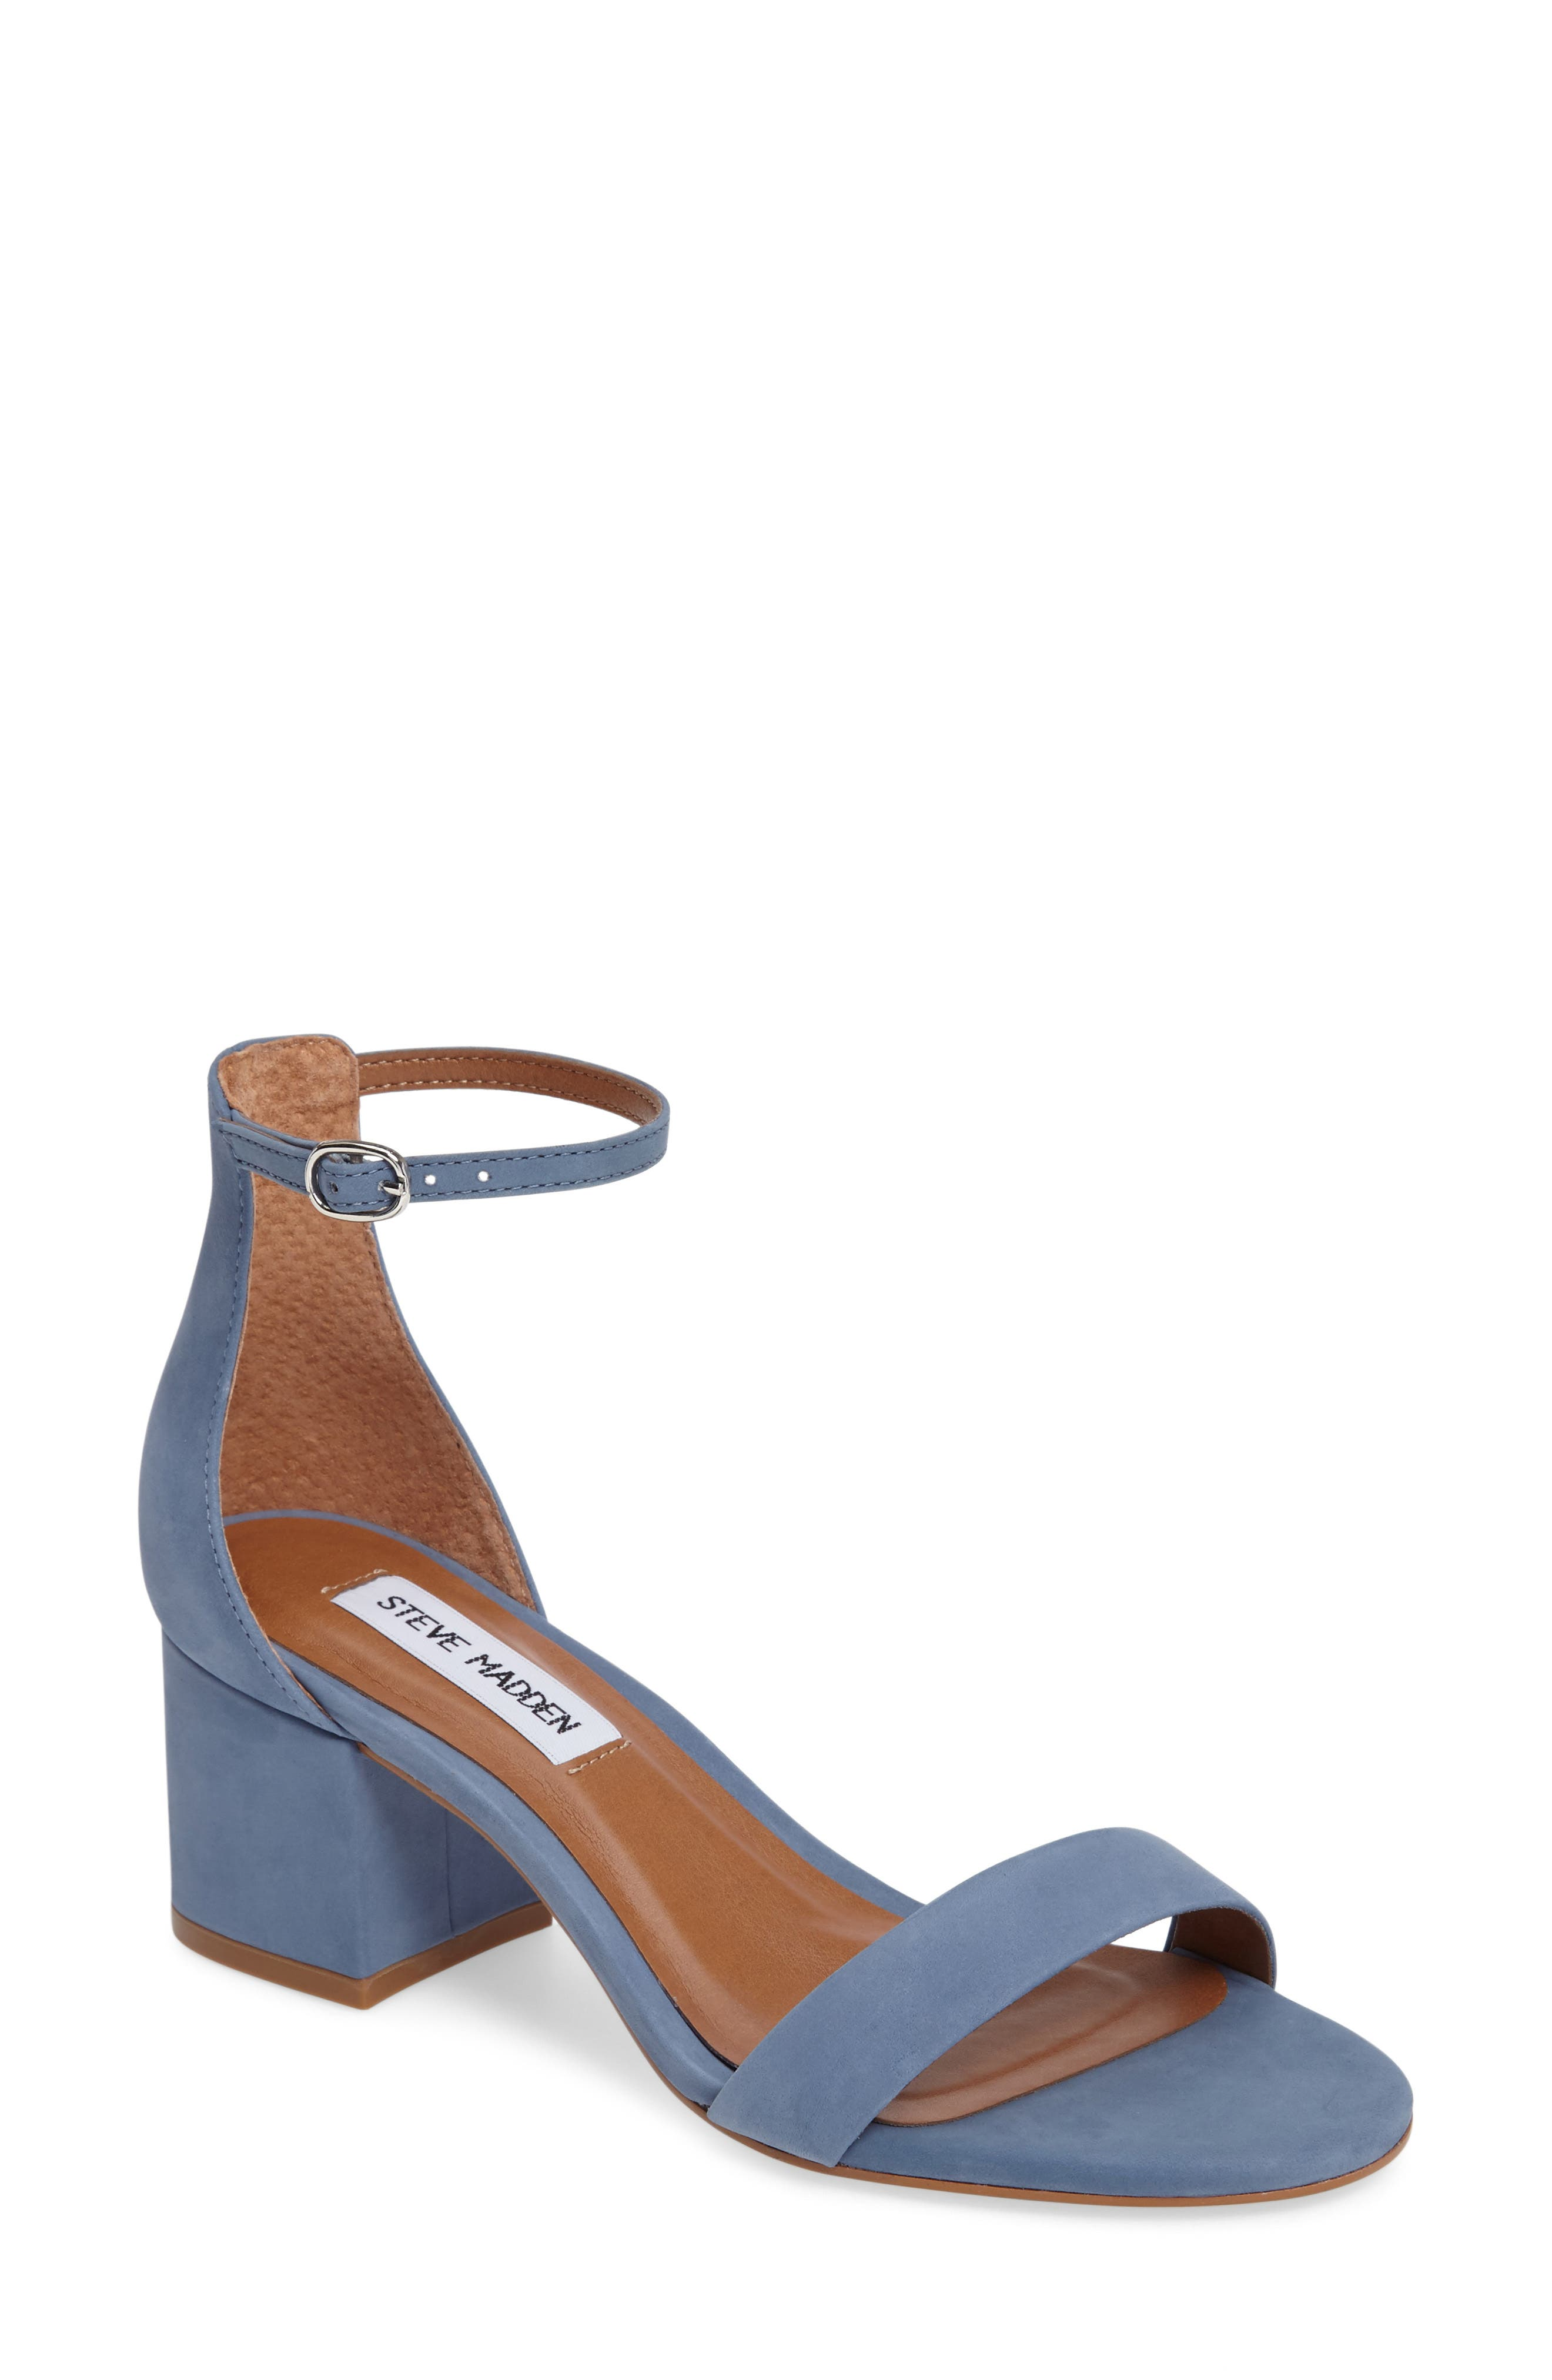 Irenee Ankle Strap Sandal,                             Main thumbnail 23, color,